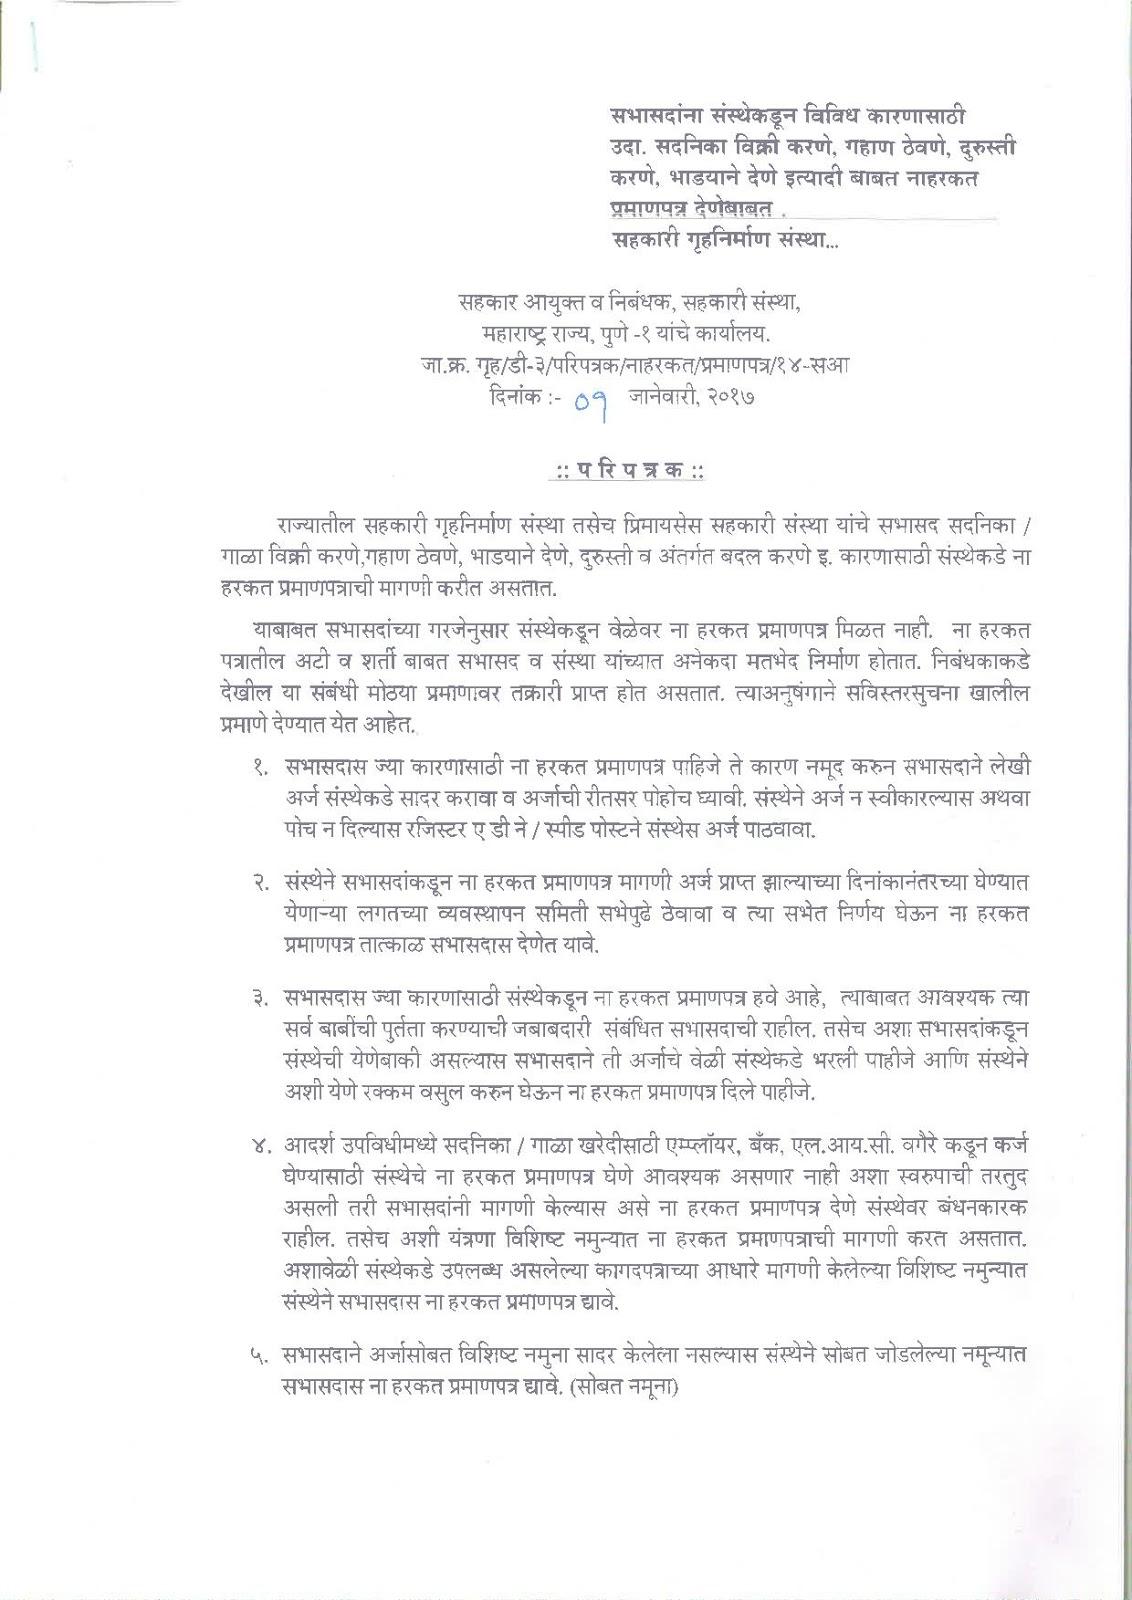 Housing Society Maharashtra Circular regarding giving No